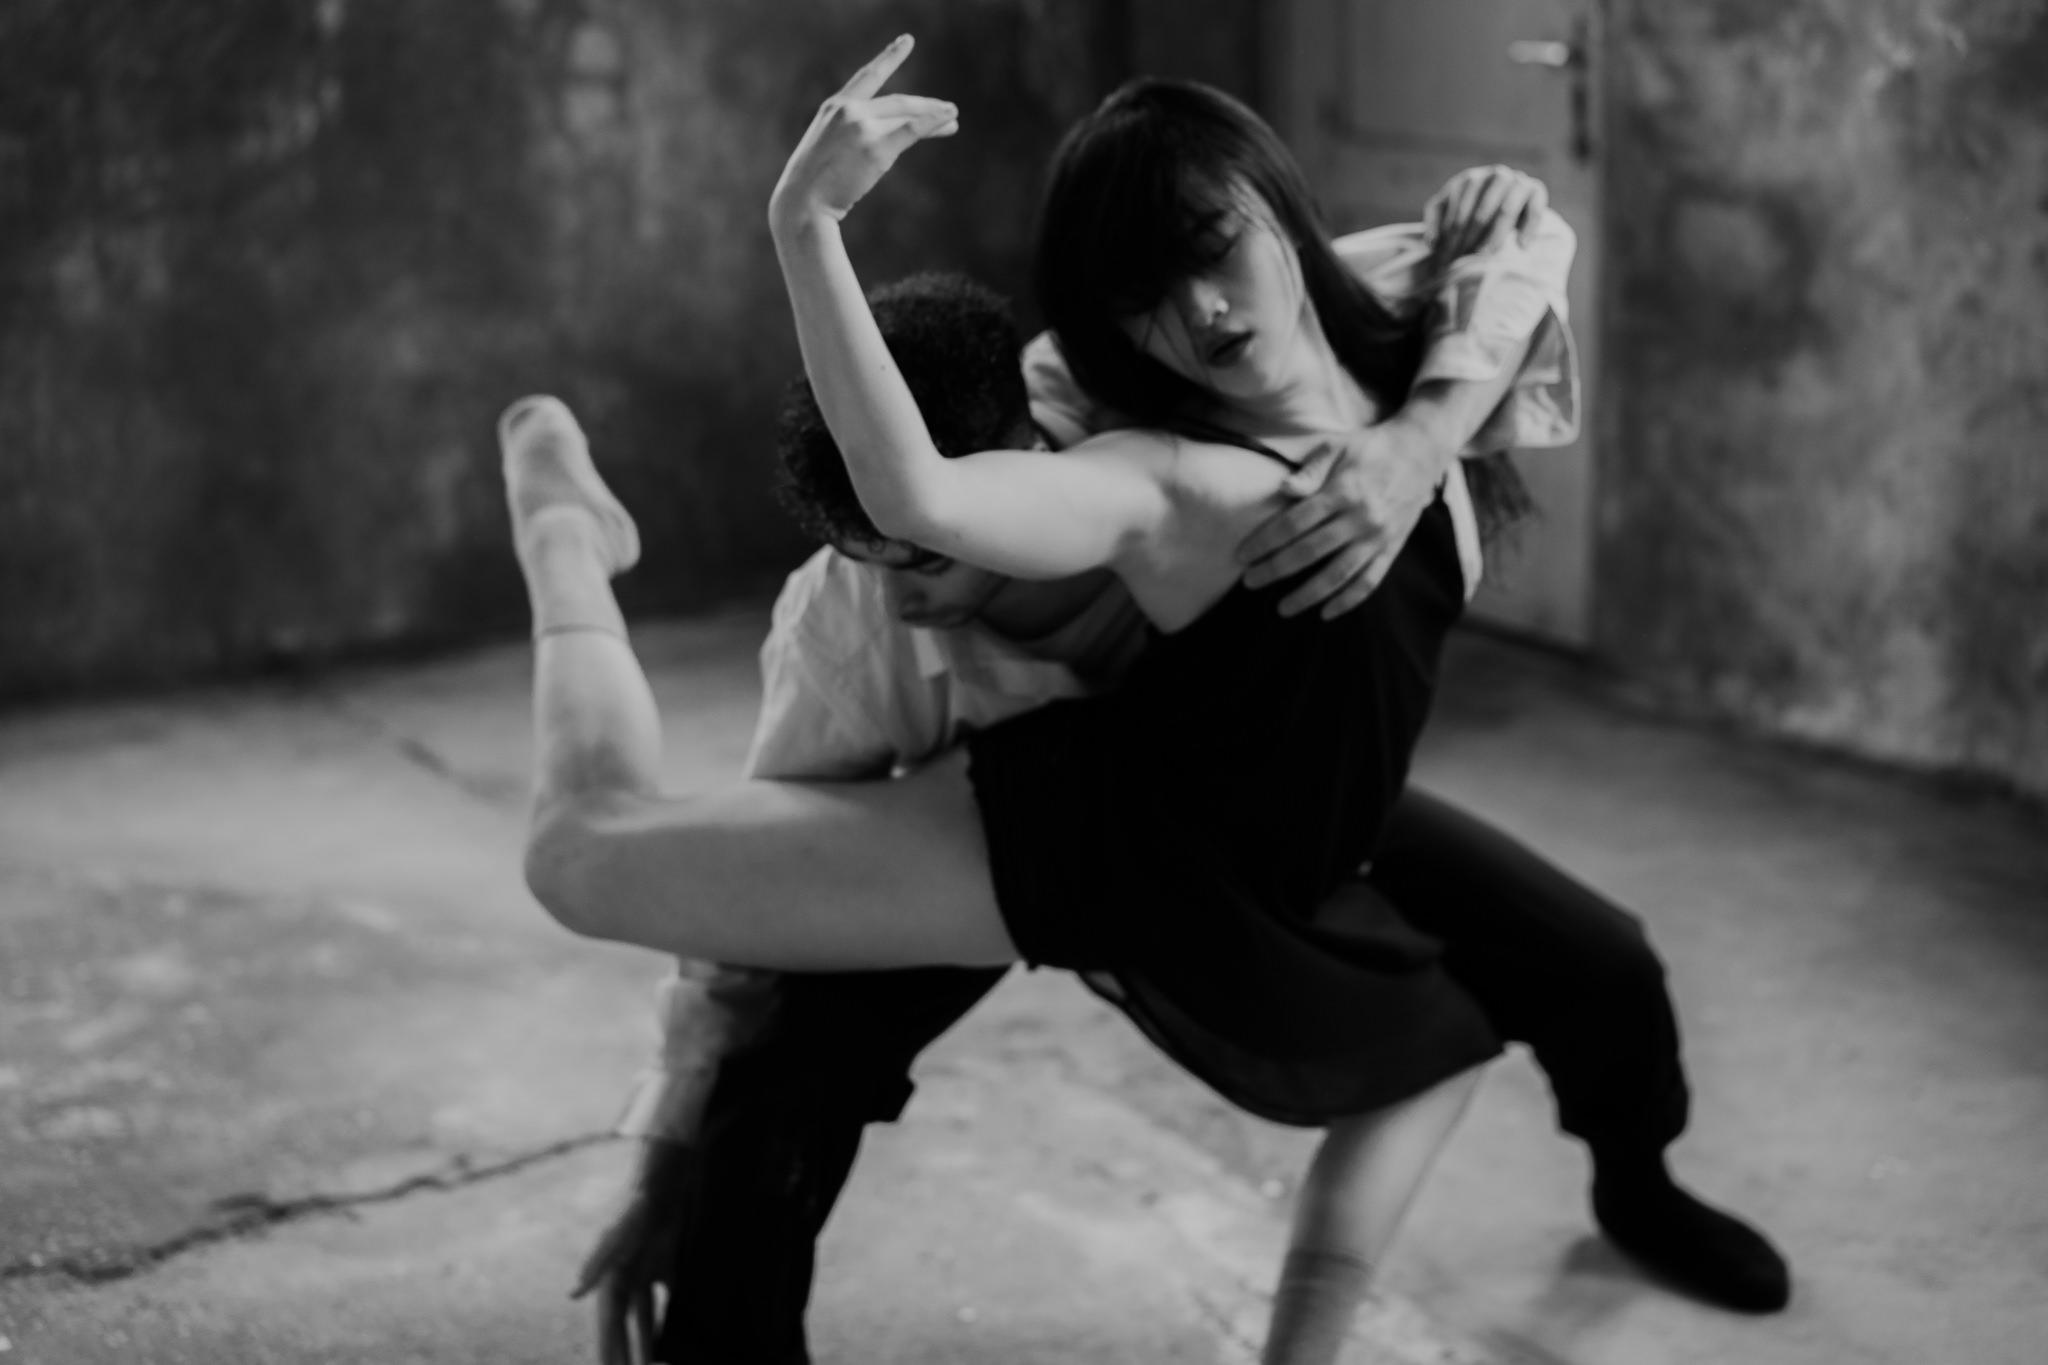 Naomi van der Kraan - Modern dance - artistic photography 09.jpg